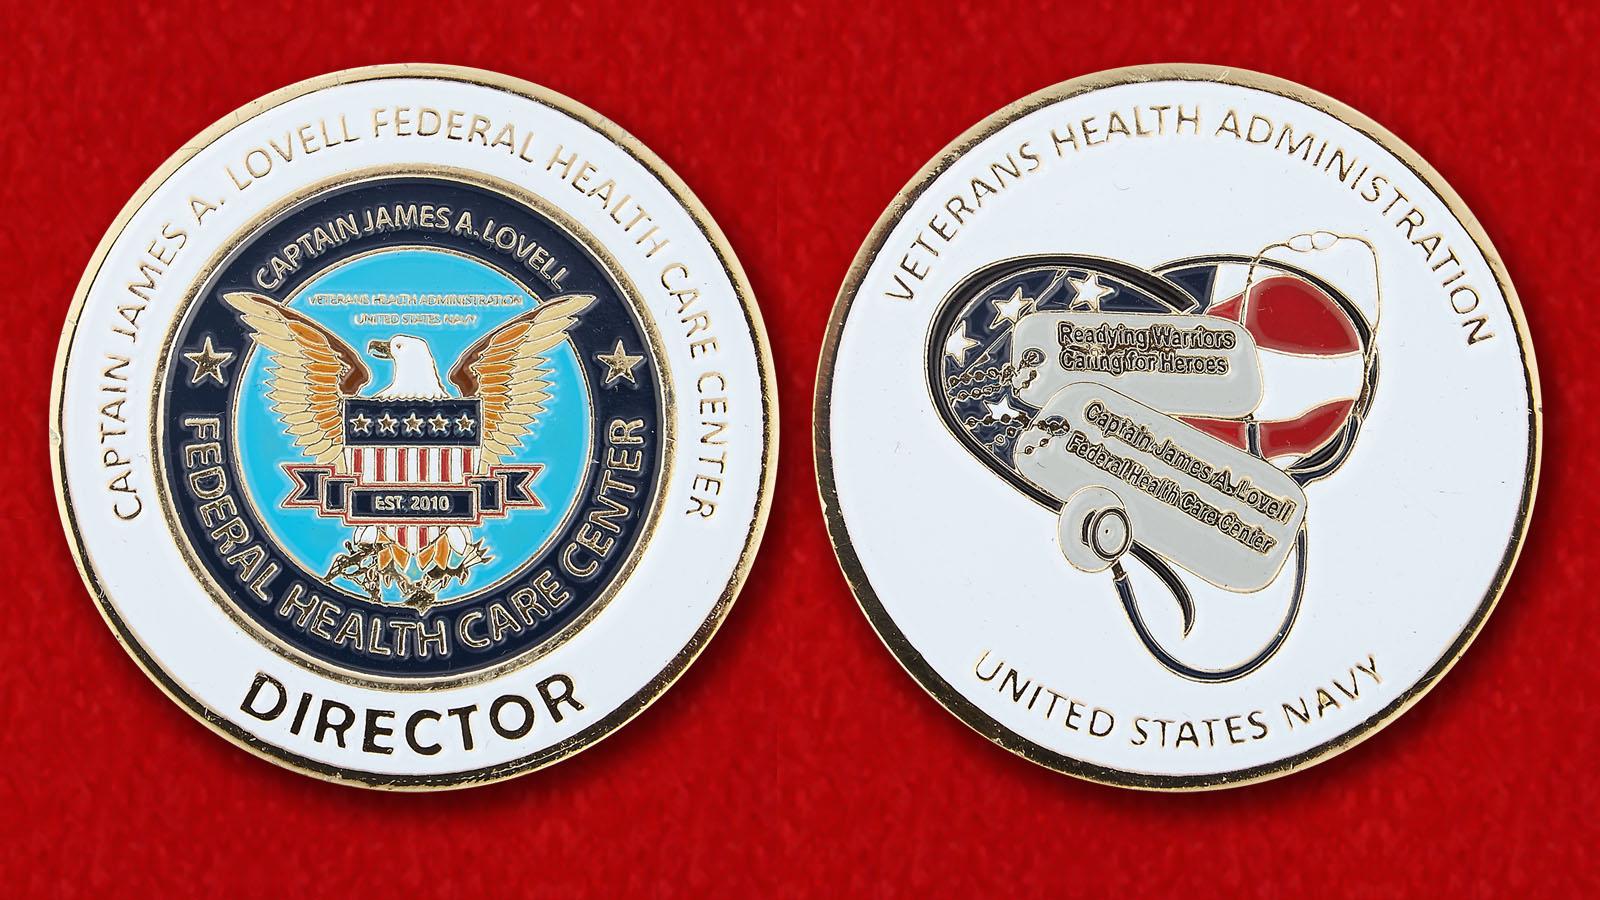 Челледж коин Федерального Центра Здравоохранения имени капитана Джеймса А. Ловелла - аверс и реверс